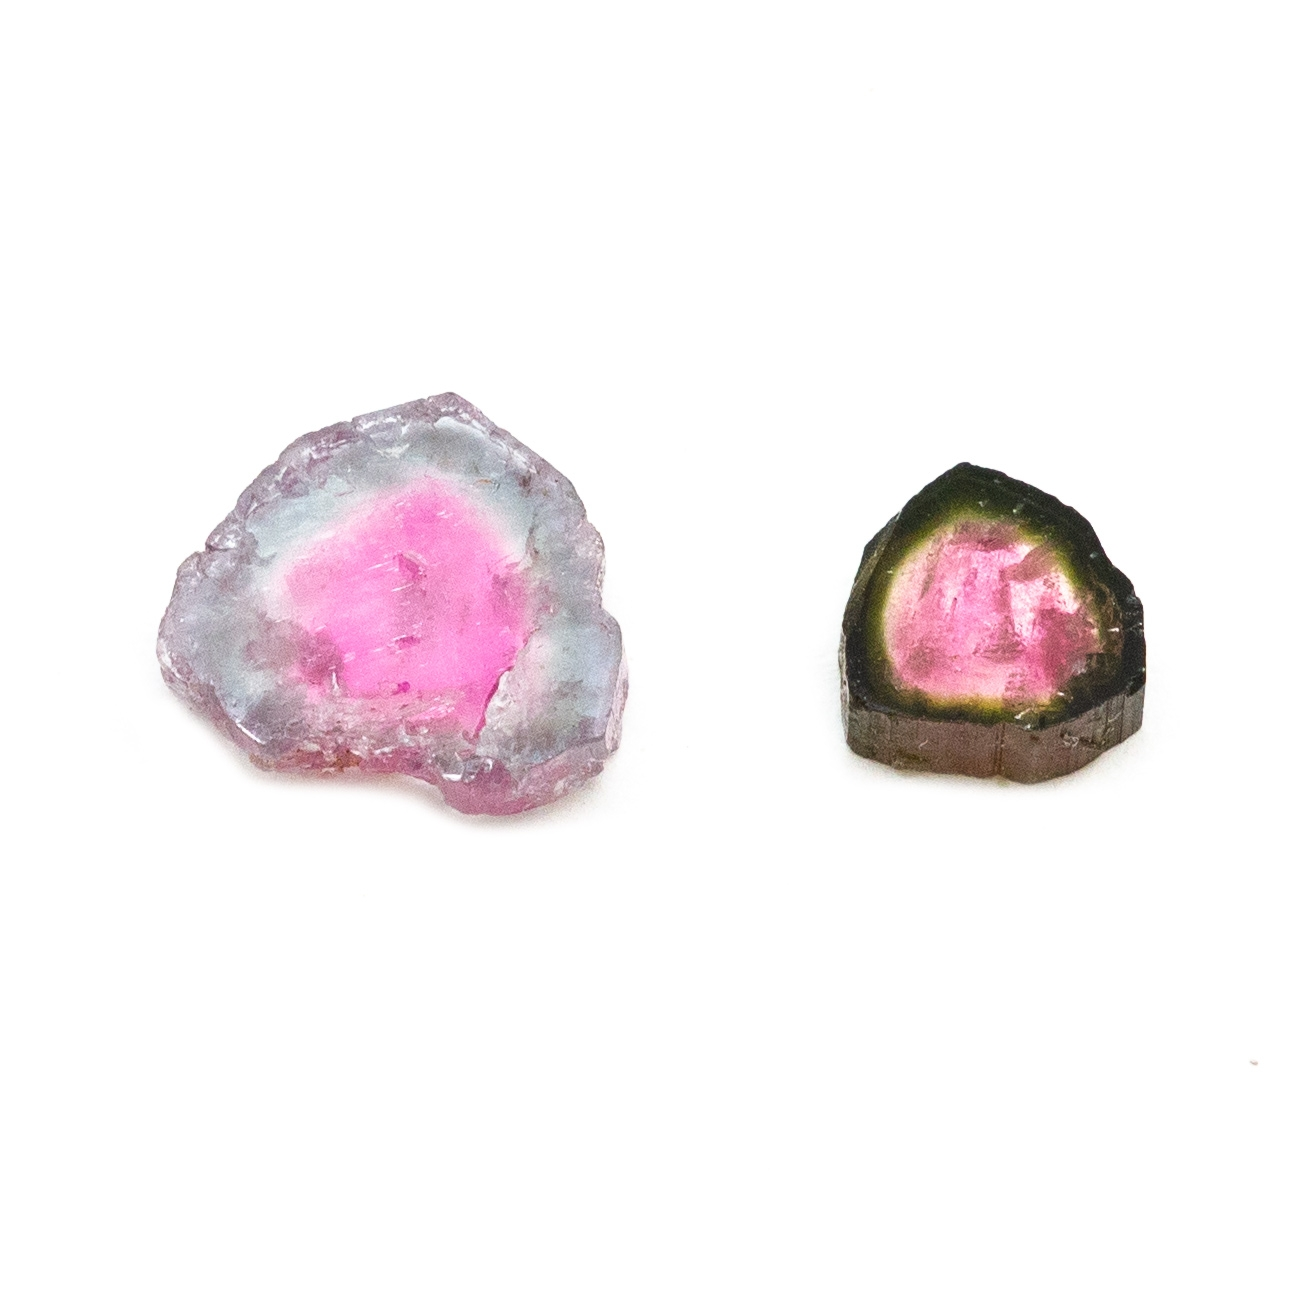 Watermelon Tourmaline Slice Pair Crystal Vaults